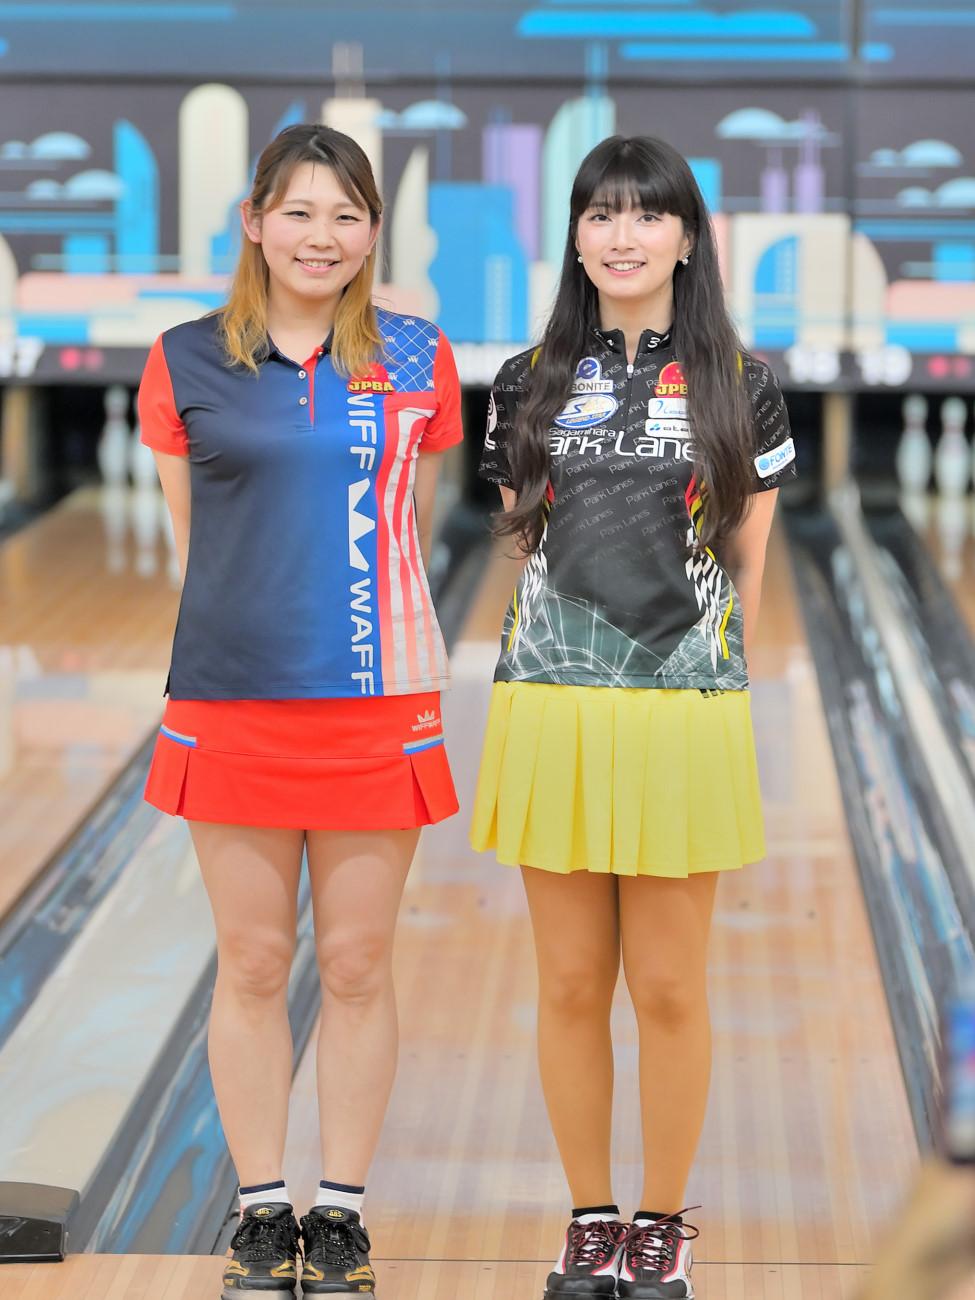 名和秋プロ(写真右)星野恵梨プロ(写真左)